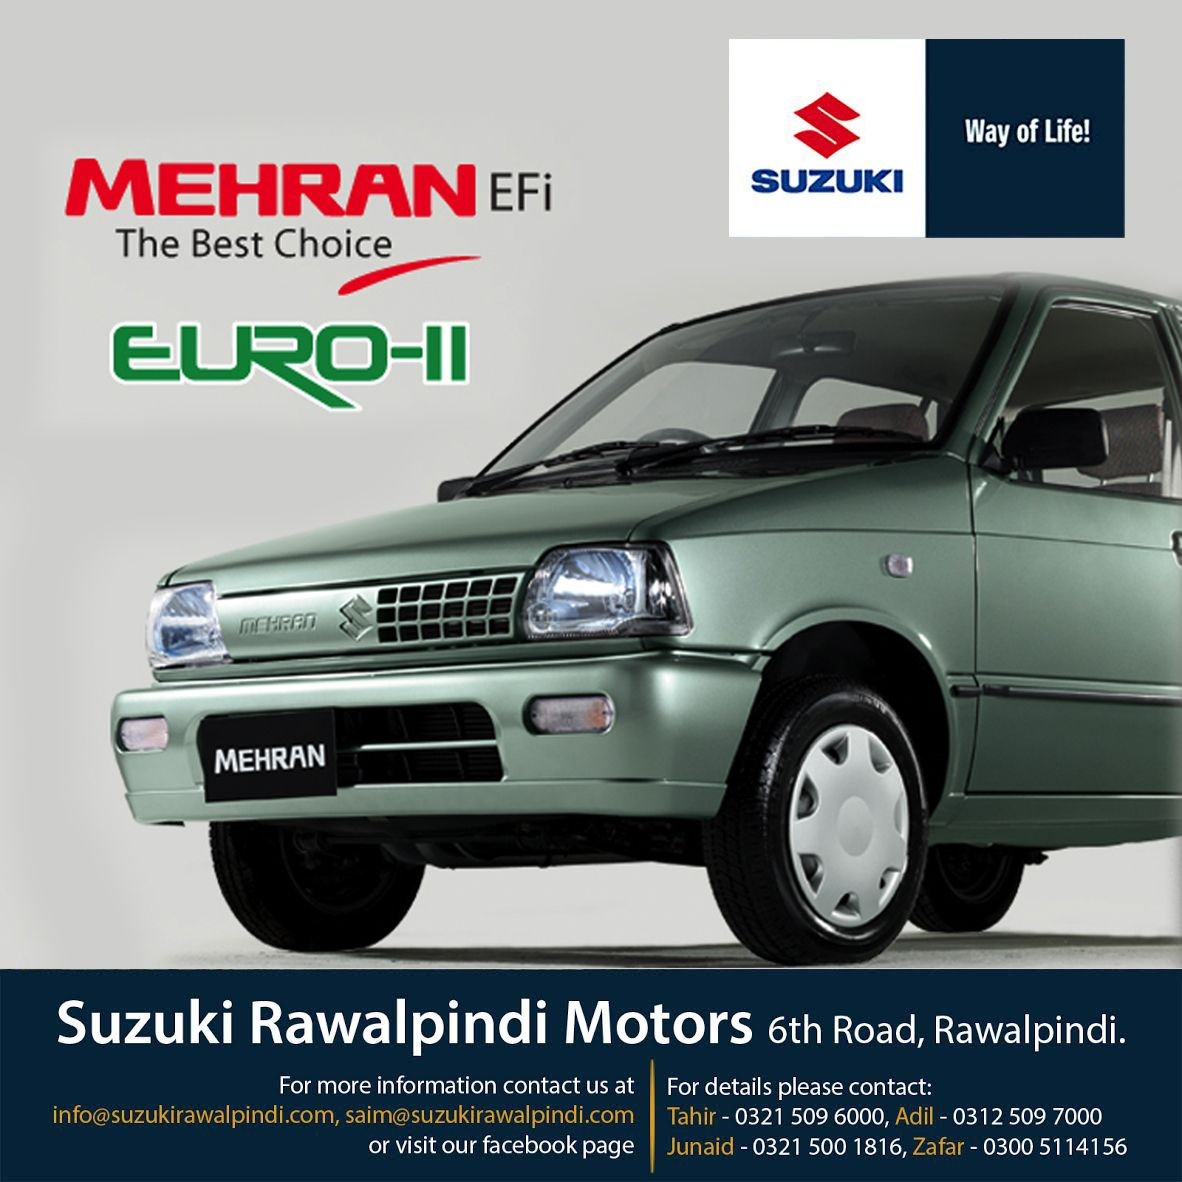 24 Best Suzuki Mehran images in 2015 | The o'jays, Automobile, Autos